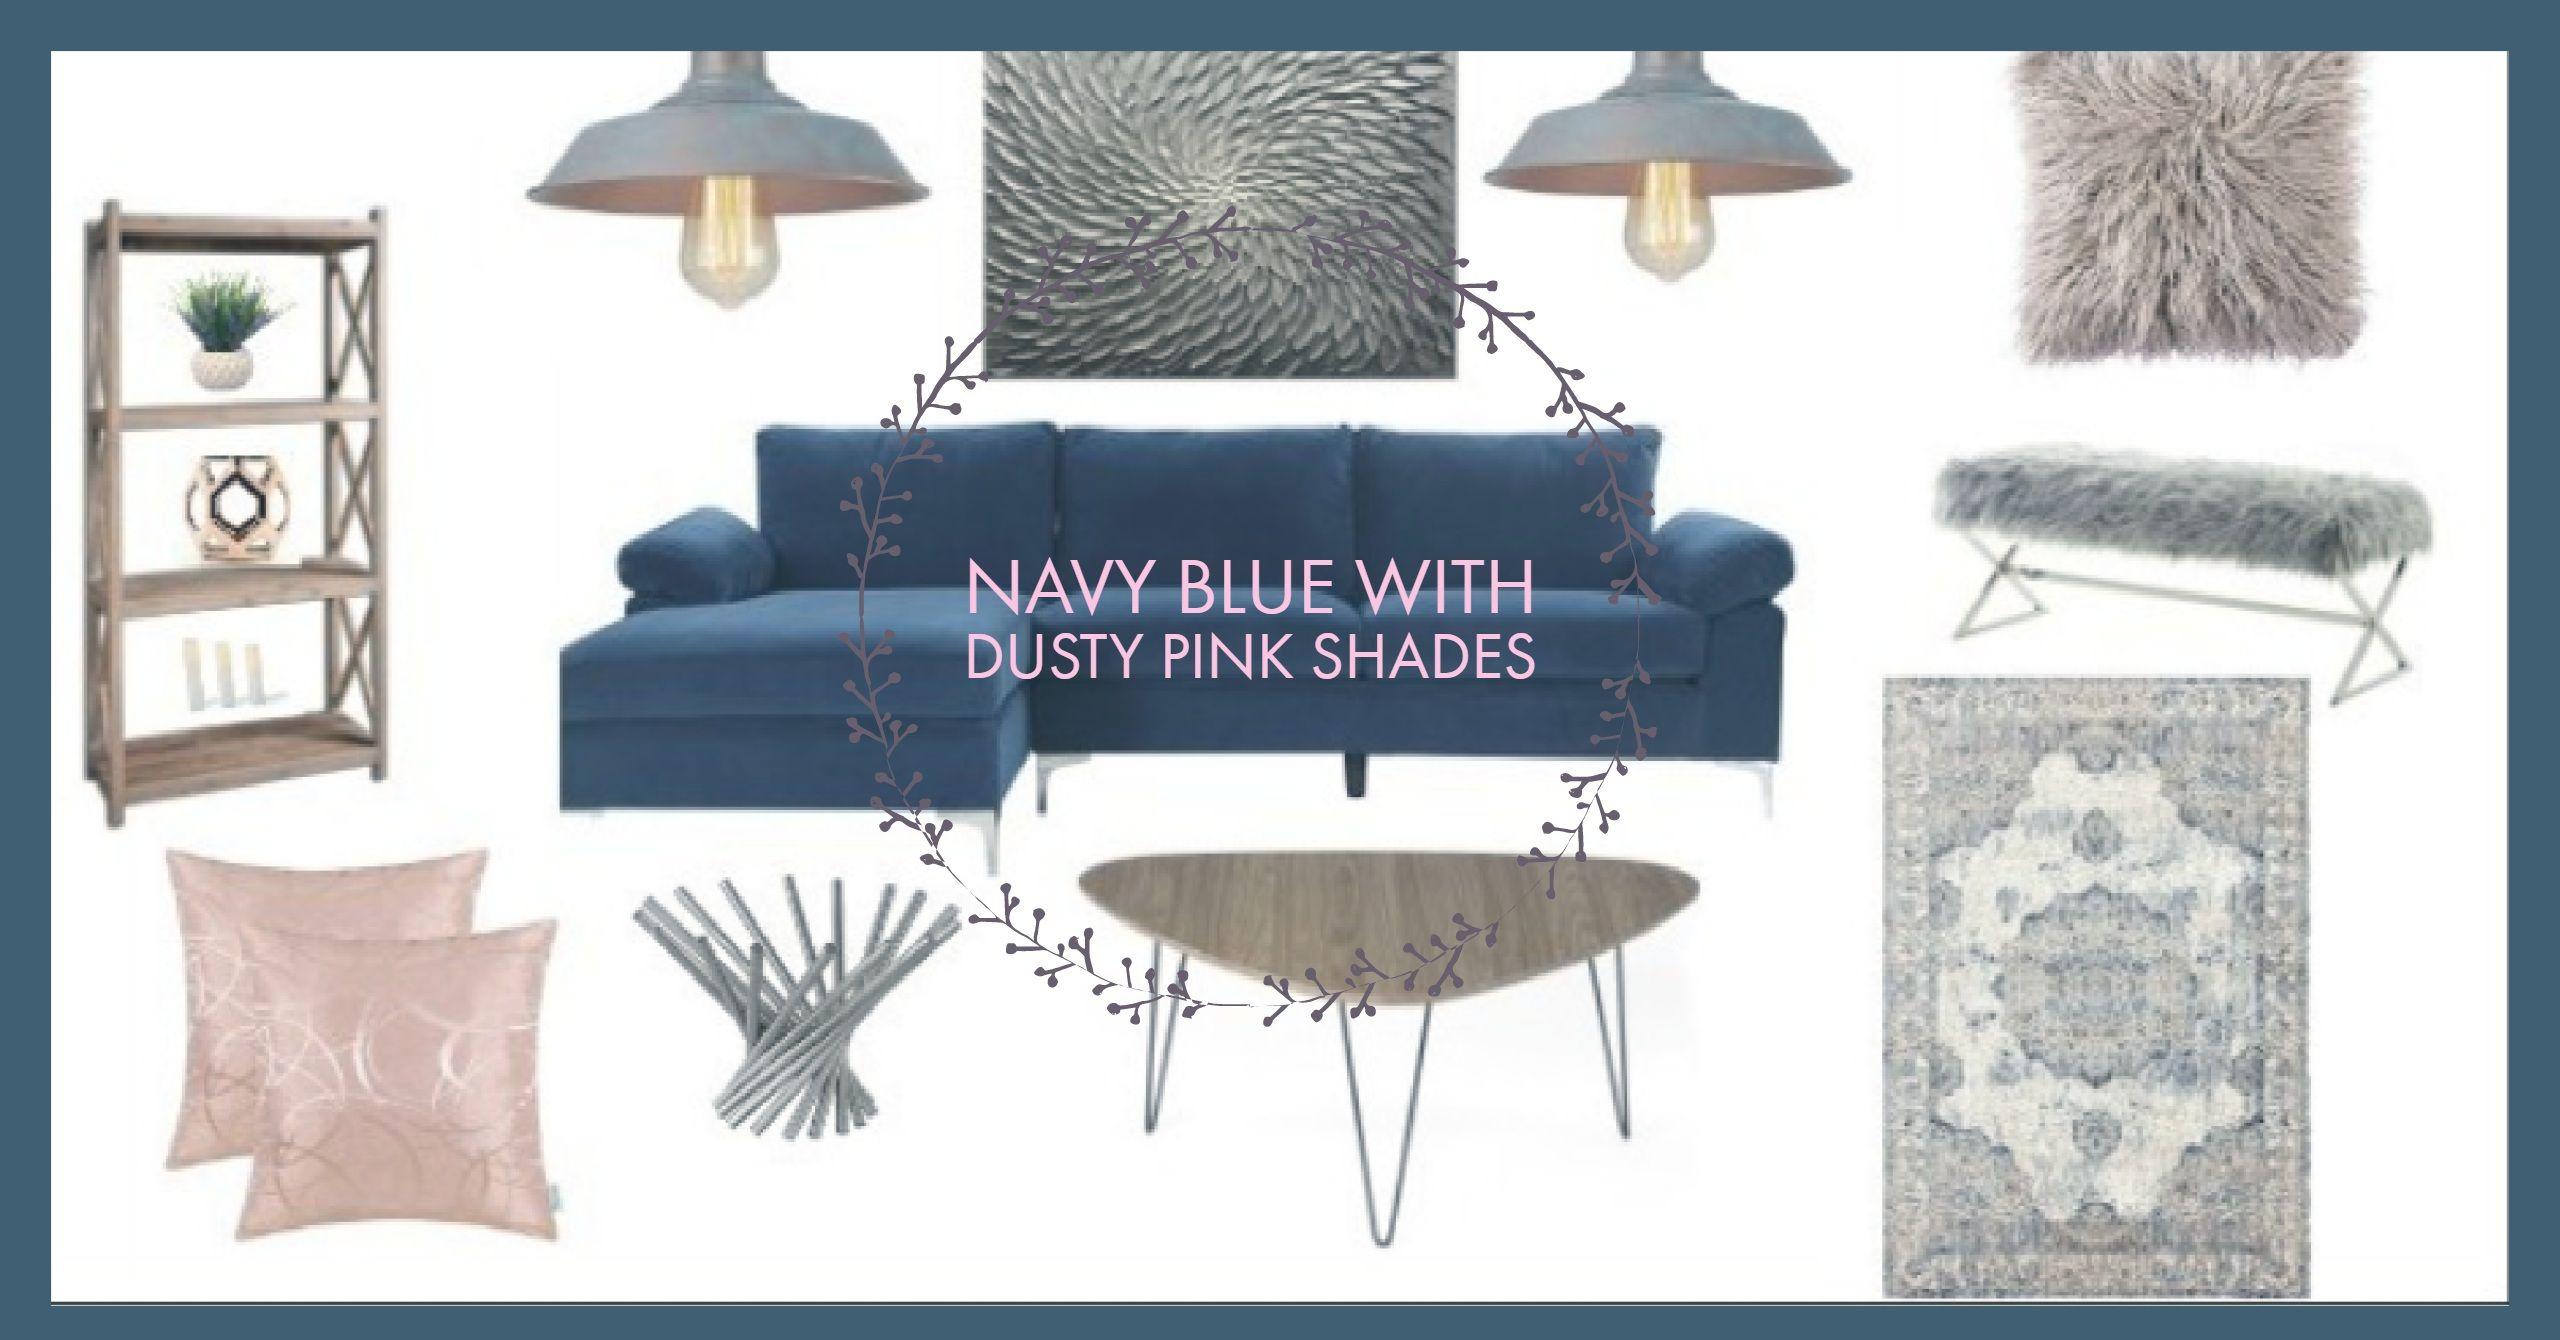 Woody Blushy Living Room Darmaze Light Blue Living Room Blush Living Room Decor Blue And Pink Living Room #navy #blue #and #silver #living #room #ideas